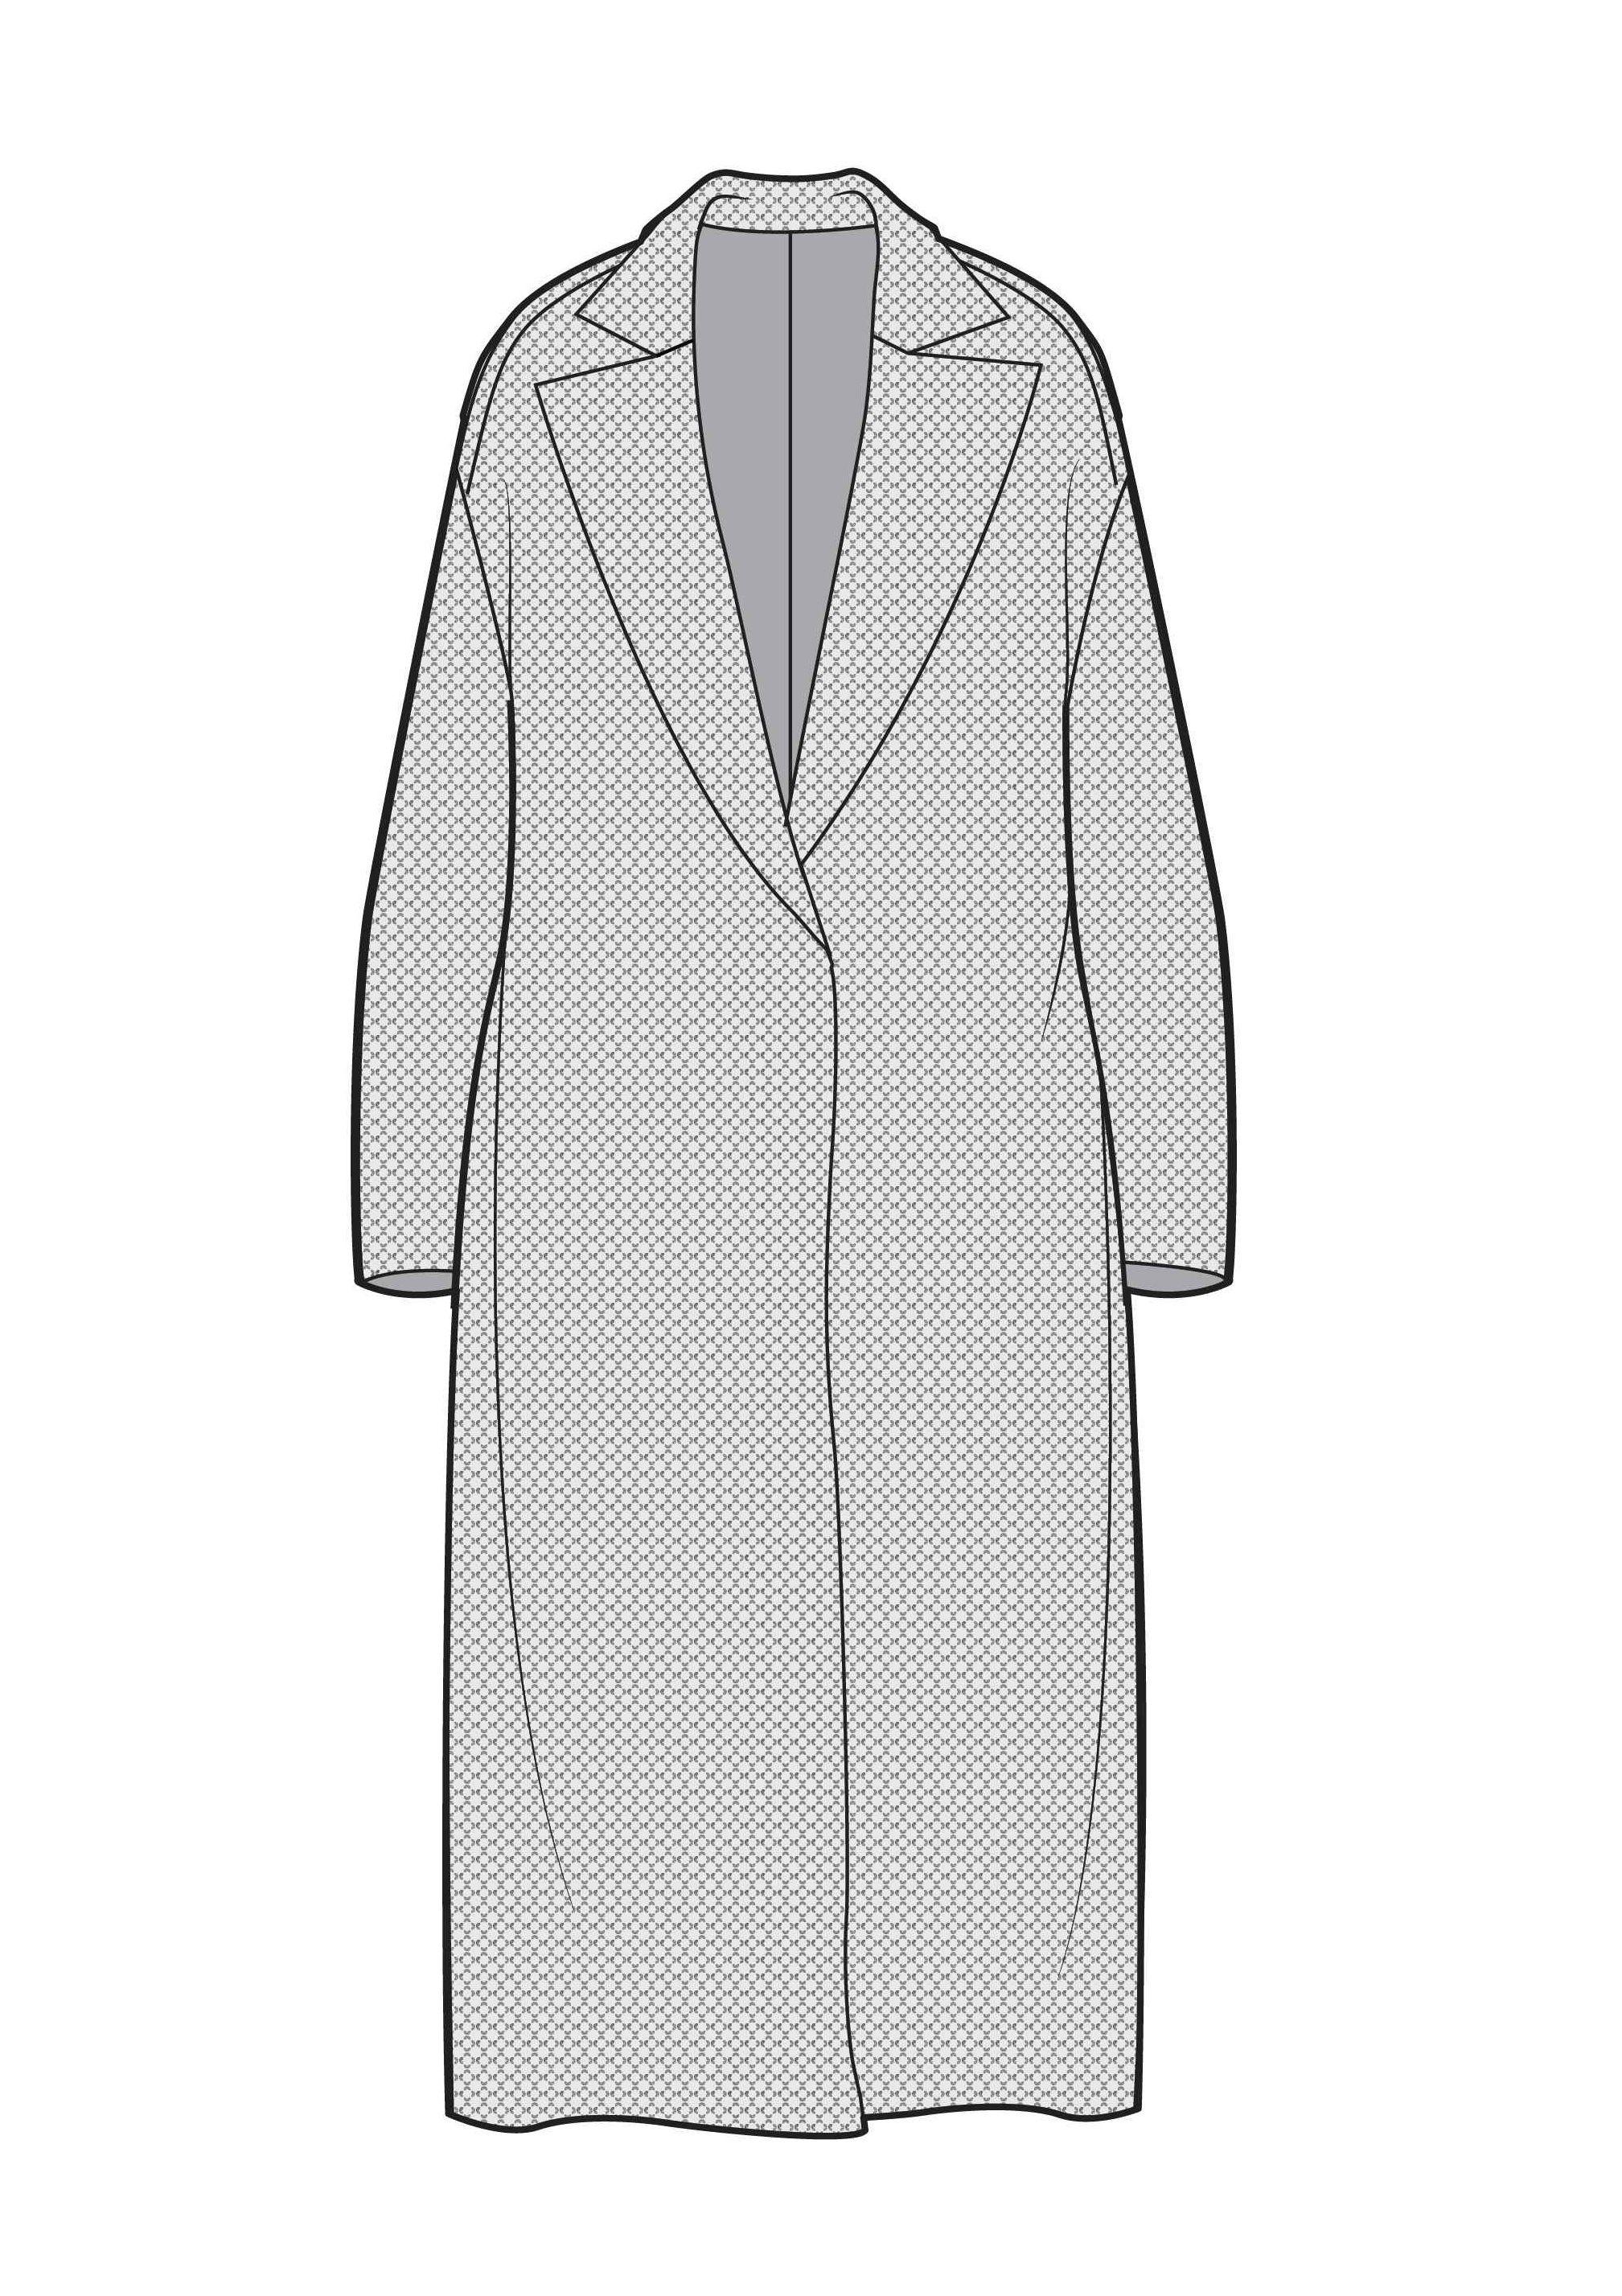 Duster coat | Illustrations|CAD|Graphics | Pinterest | Dusters ...